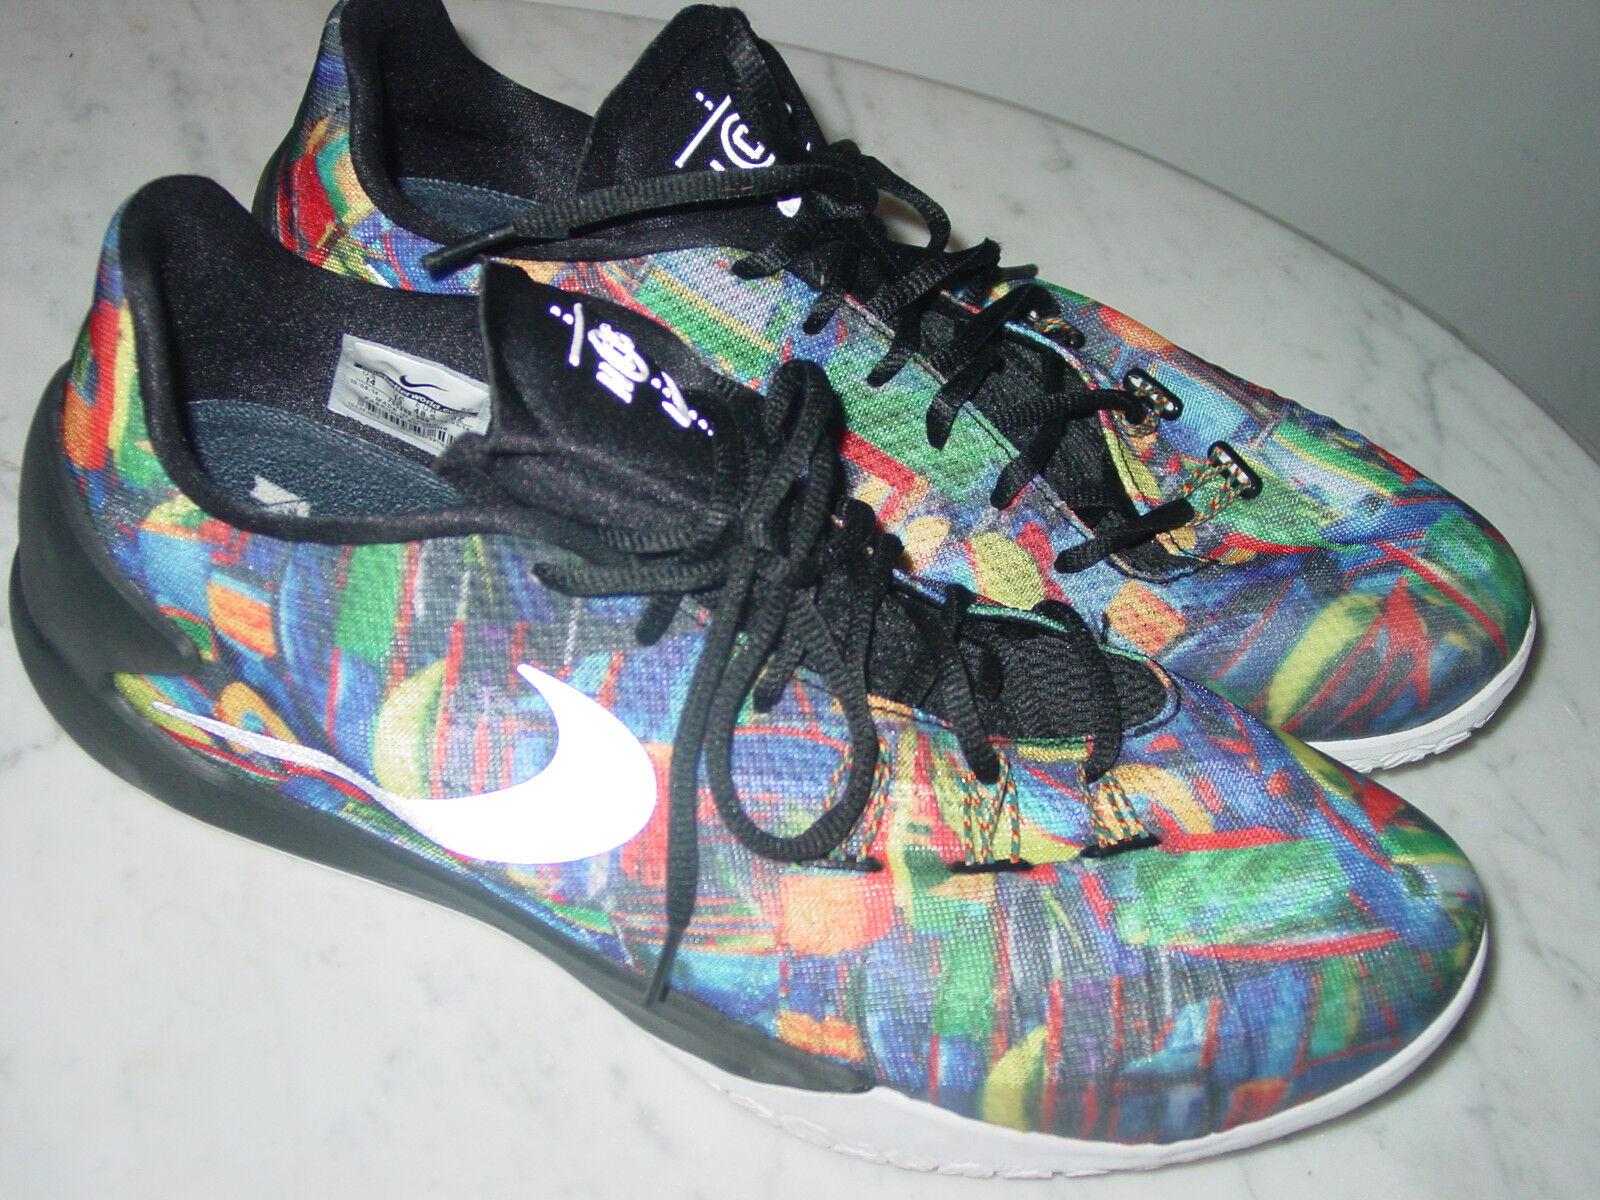 2014 Mens NCS Nike Hyperchase PRM QS NCS Mens Multi-Color/Black Basketball Shoes! Size 14 04136e